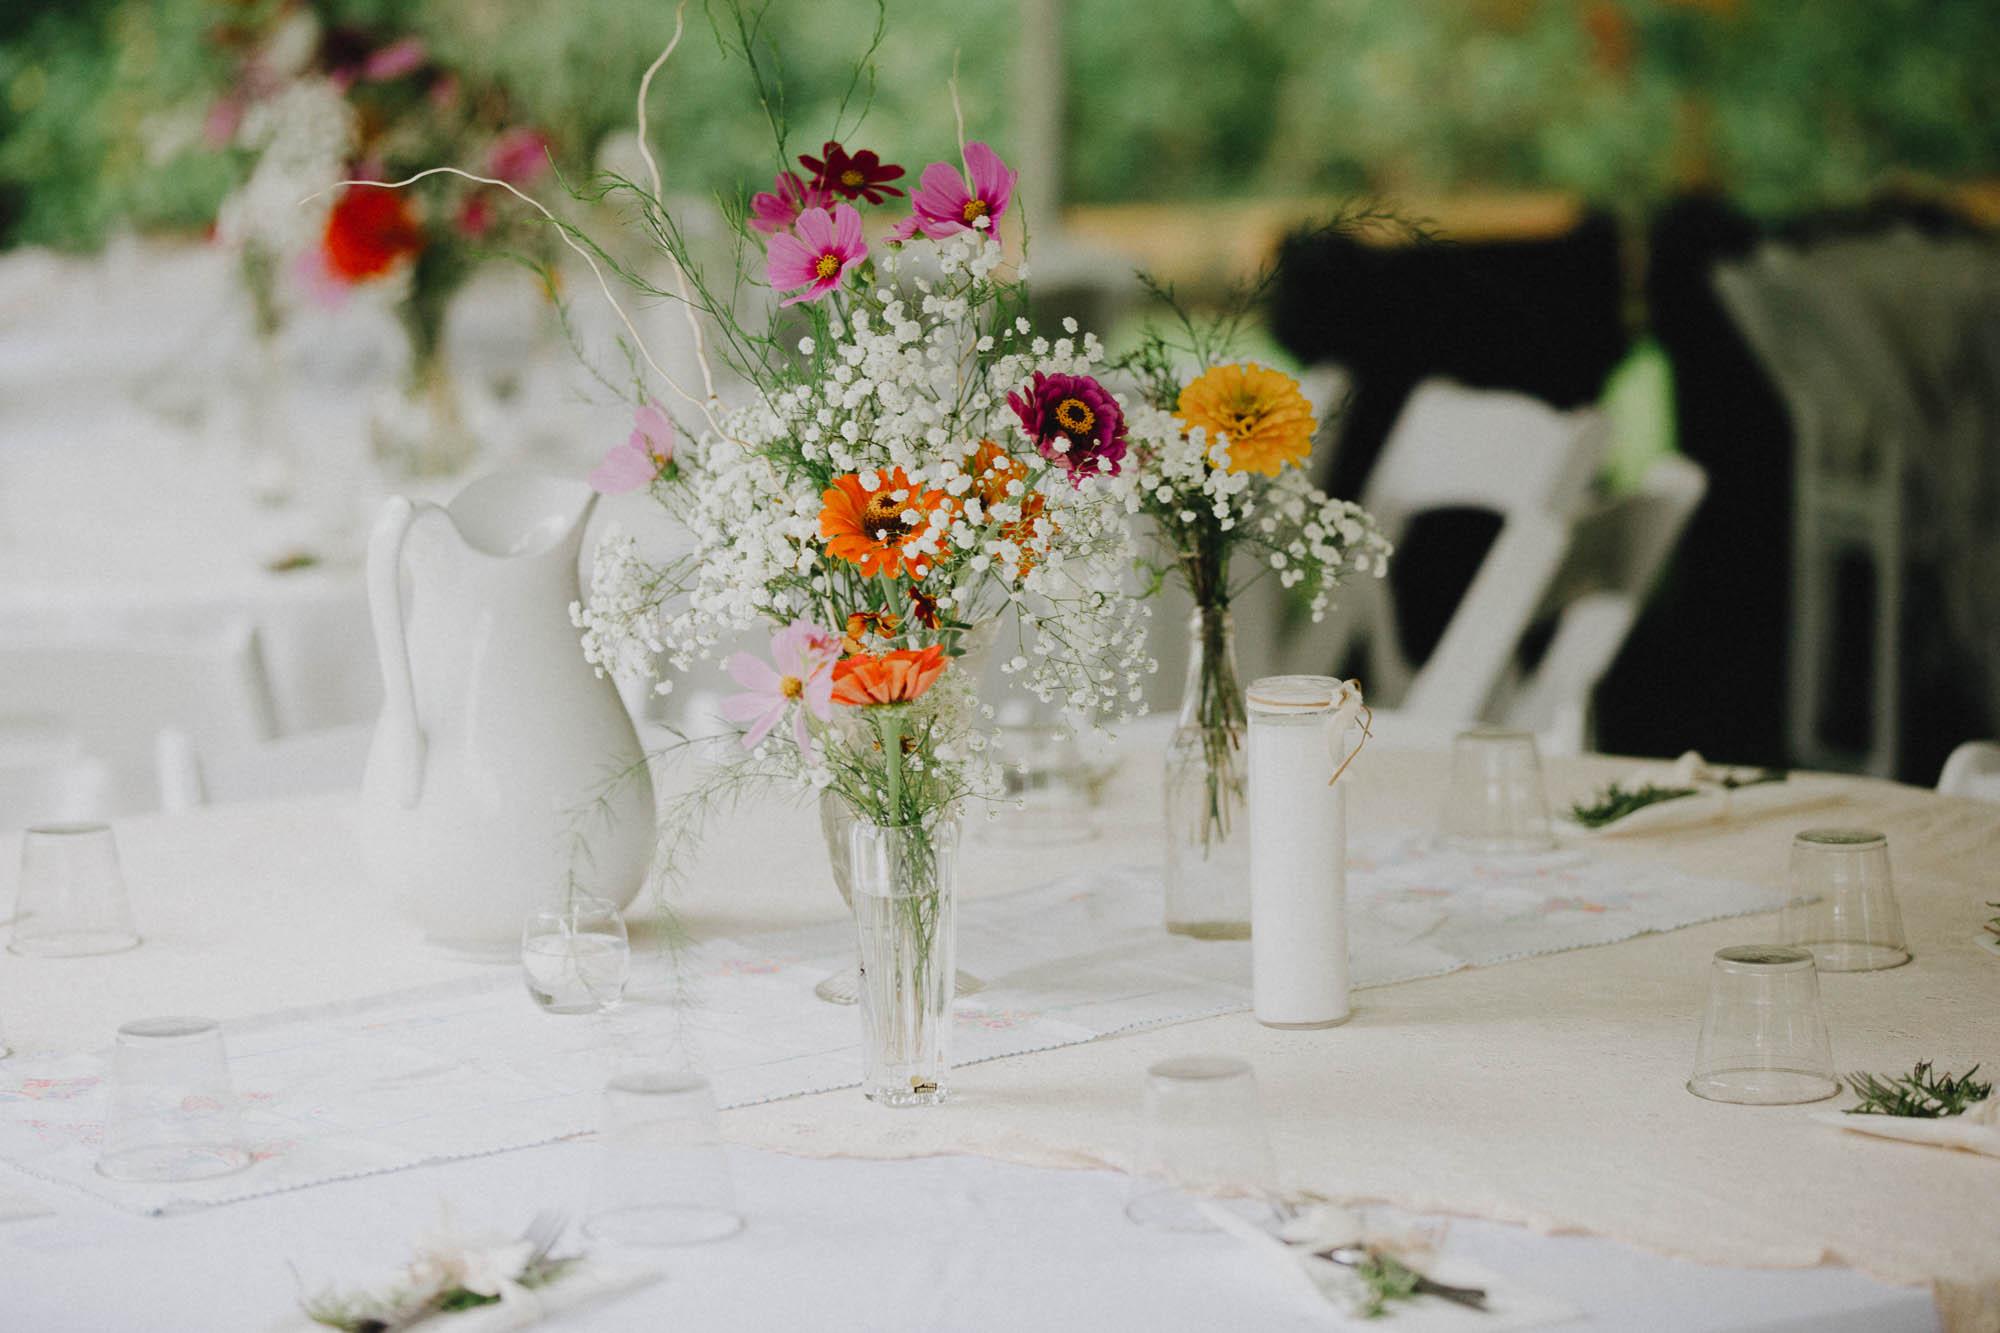 Leah-Graham-Outdoor-DIY-Michigan-Wedding-Details-012@2x.jpg